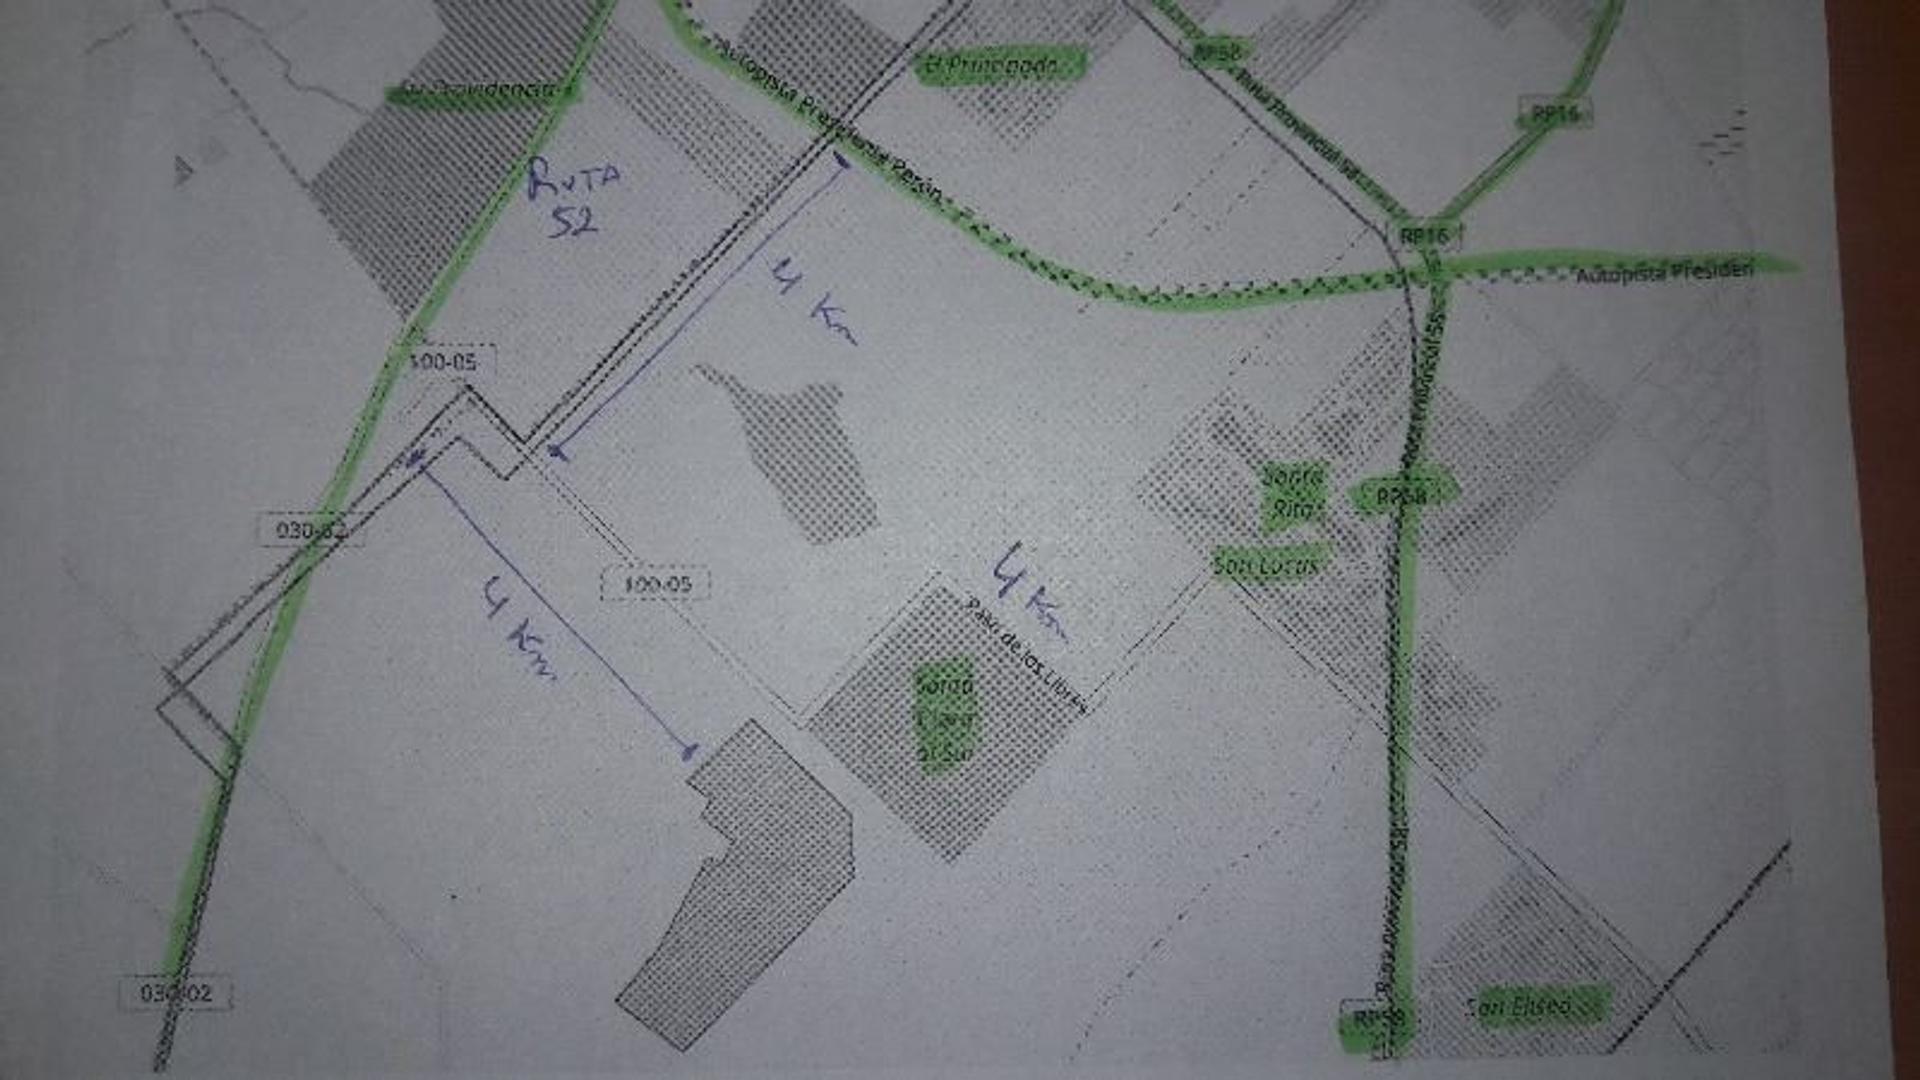 Campo en Venta 70 hectareas